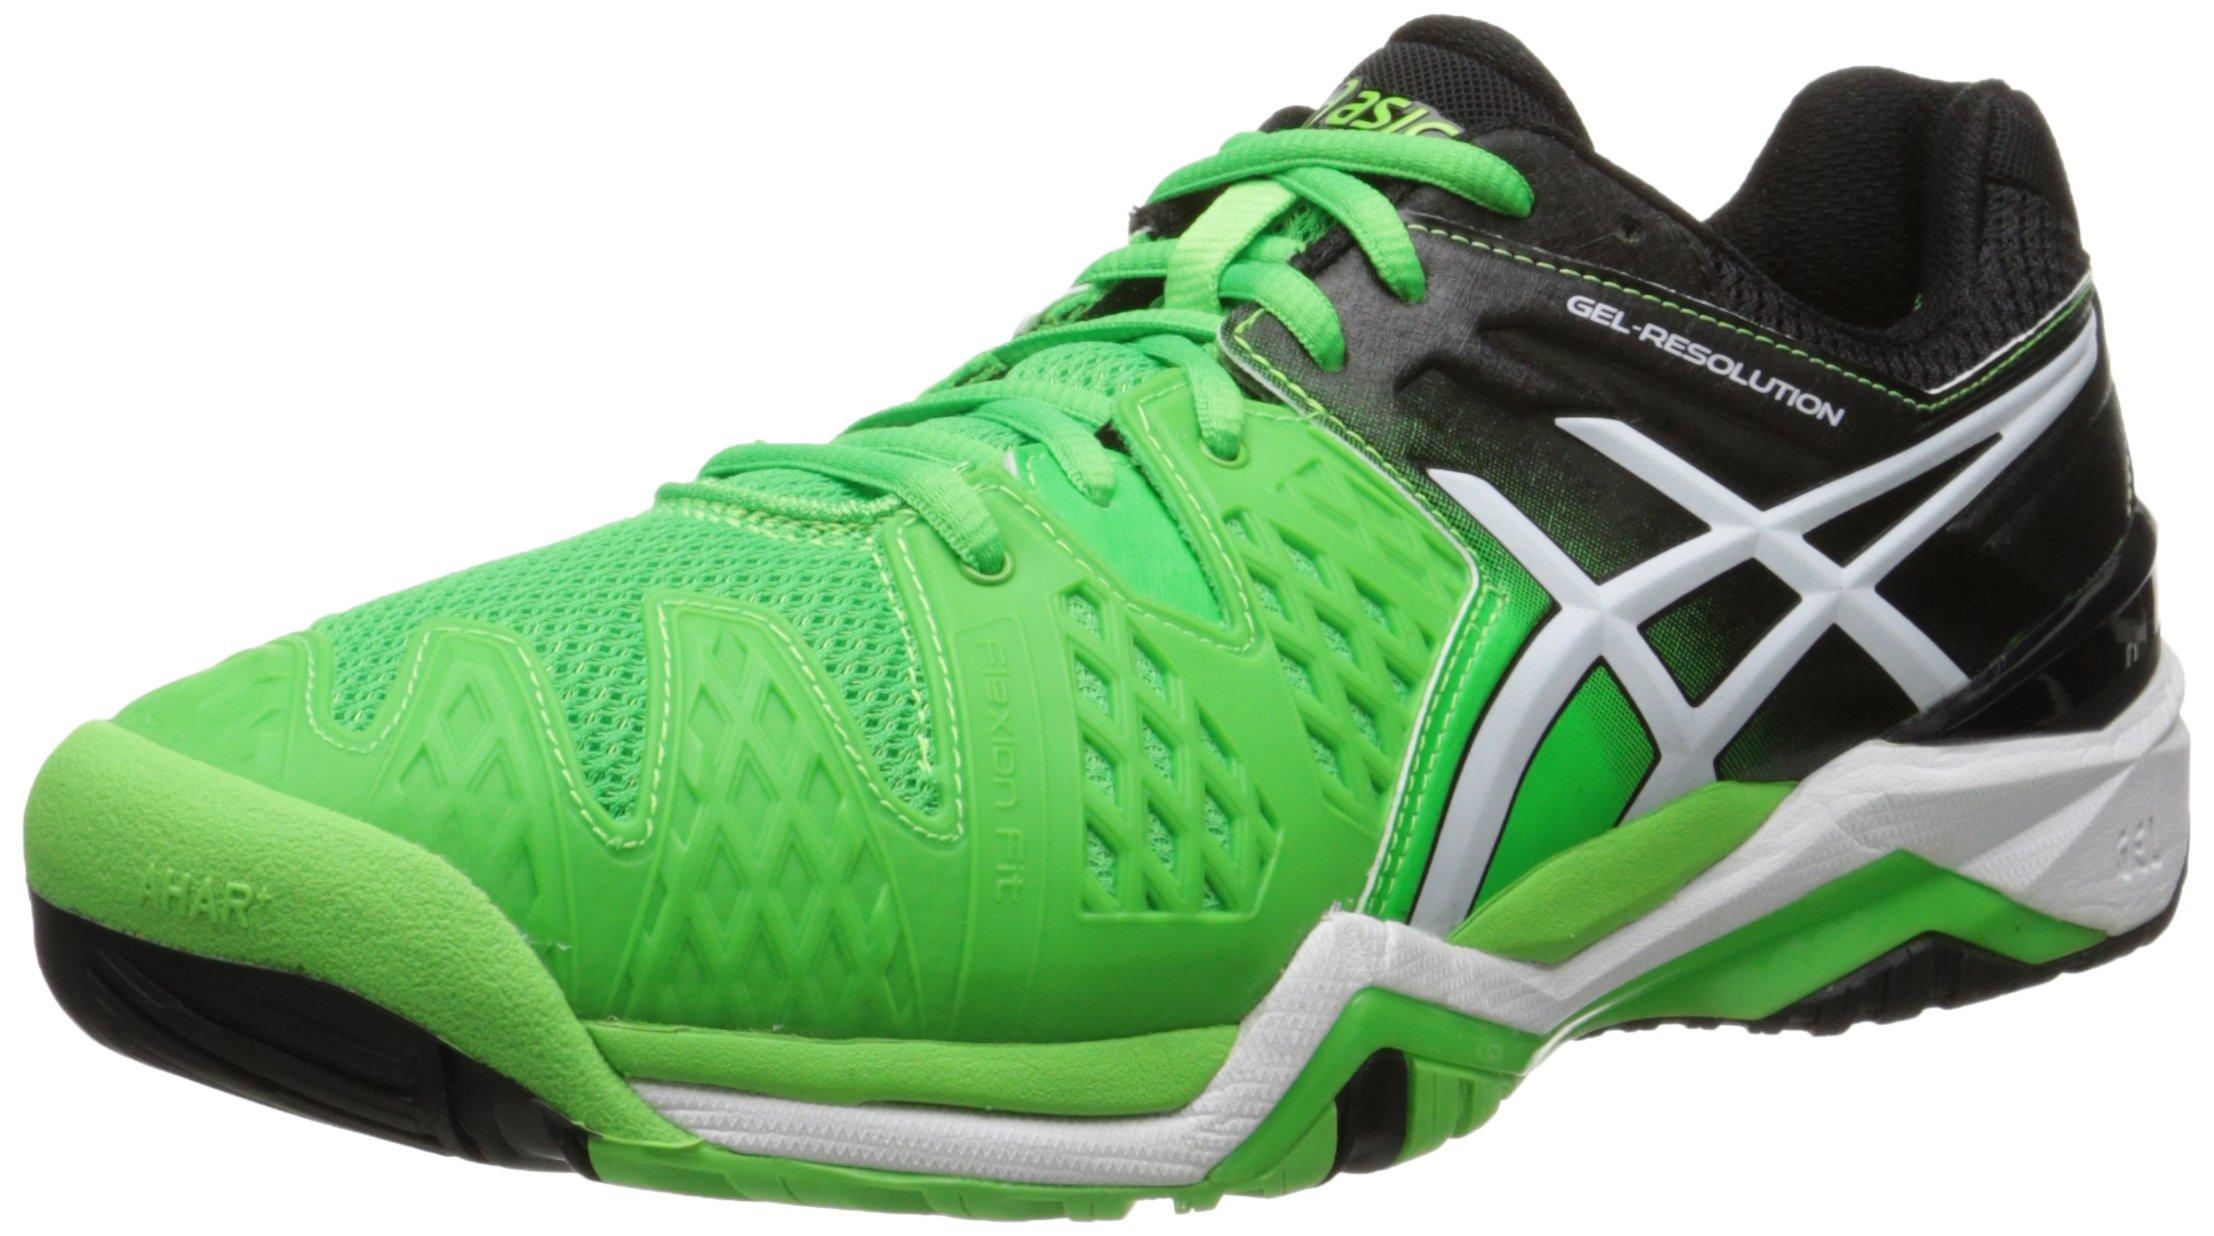 db2ca4cc08 Galleon - ASICS Men's Gel-Resolution 6 Tennis Shoe, Flash  Green/White/Black, 10 M US